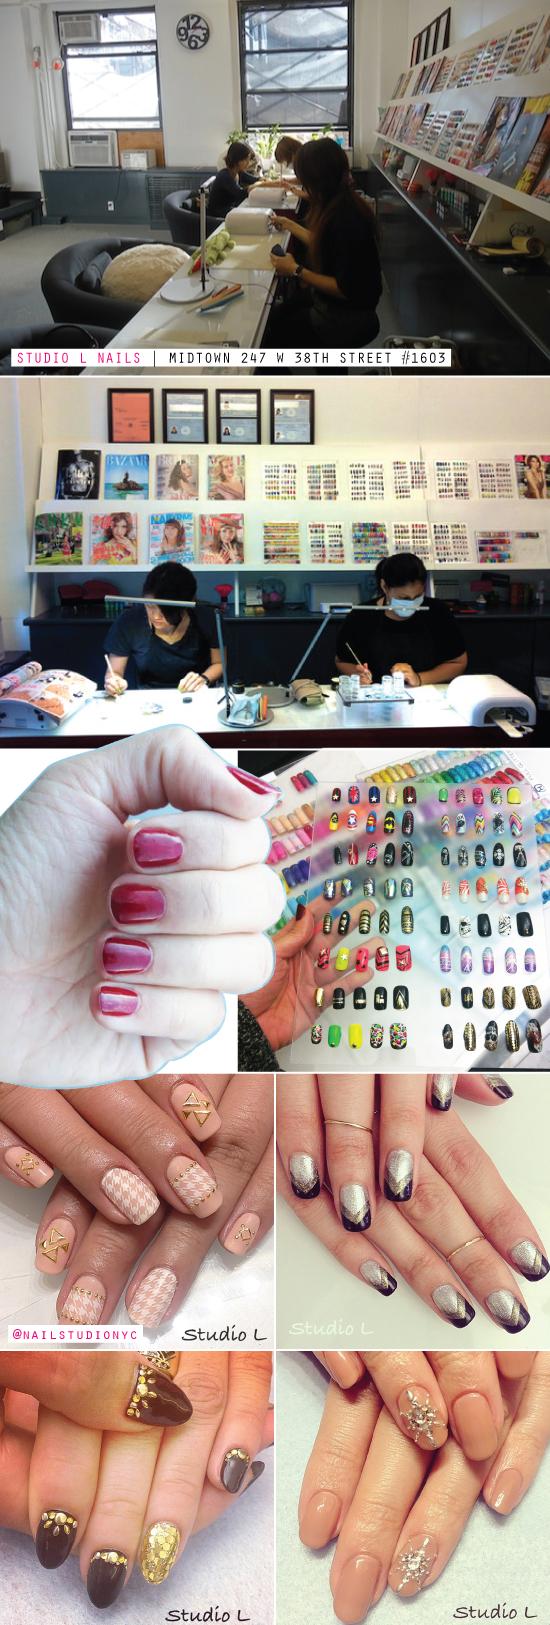 NY-UNHAS-manicure-salao-onde-fazer-indicacao-nail-art-decoradas-dica-viagem-beleza-esmalte-salon-dica-tips-travel-blog-studio-l-midtown